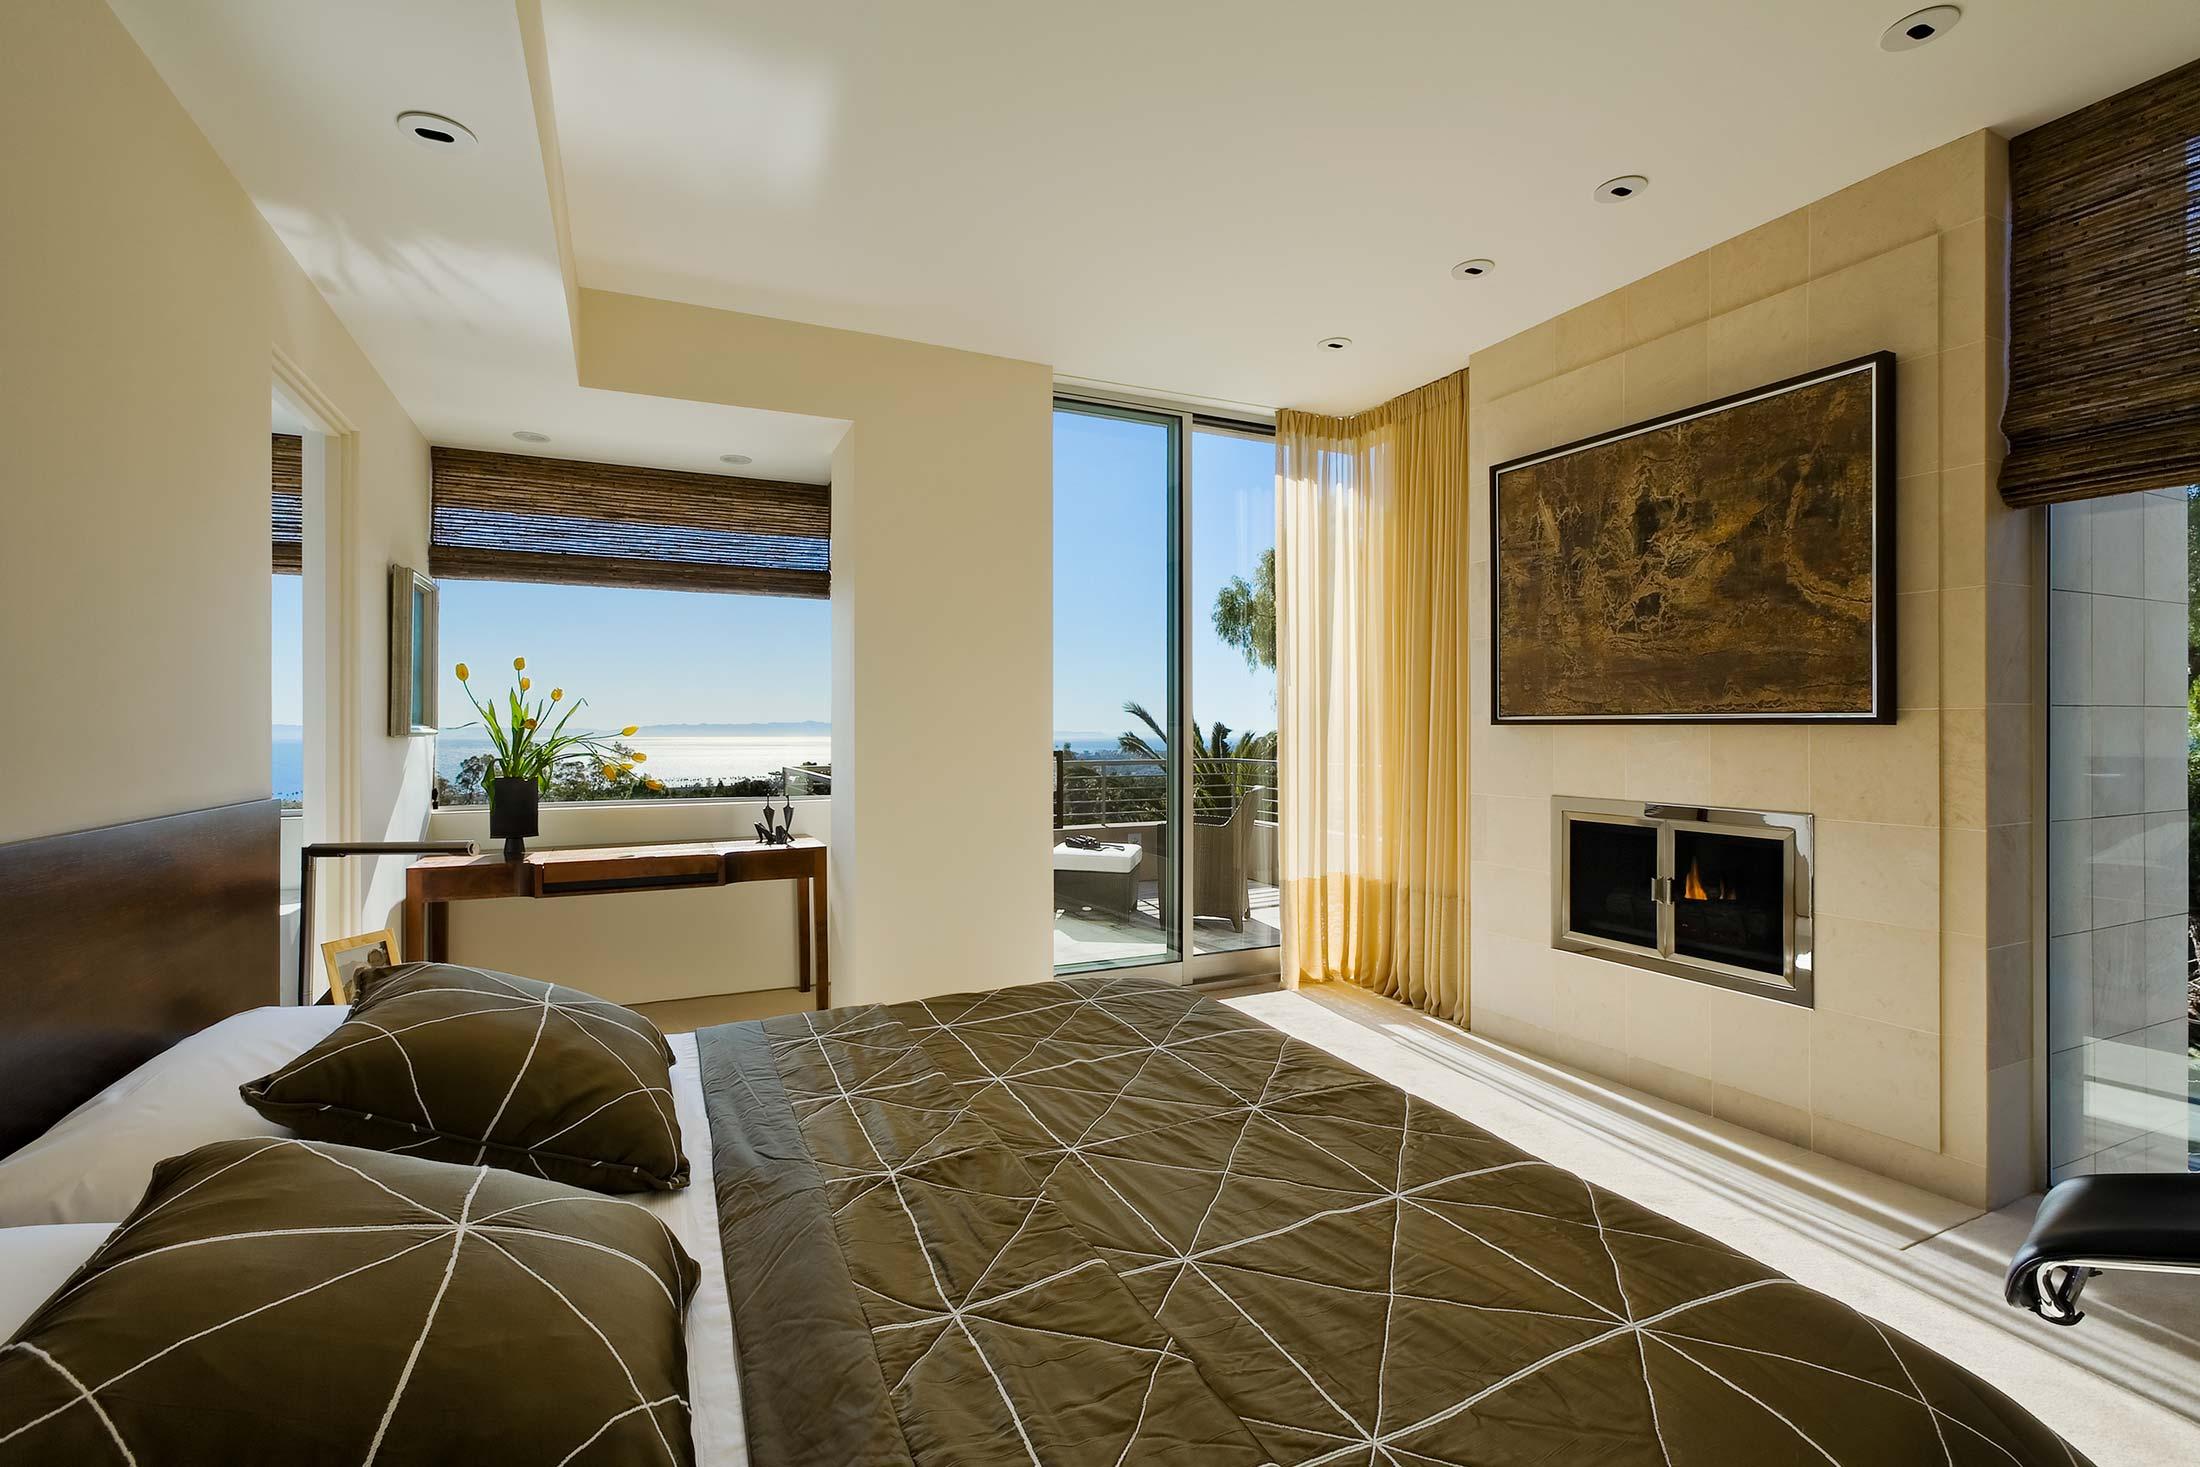 Riviera Residence Shubin Donaldson